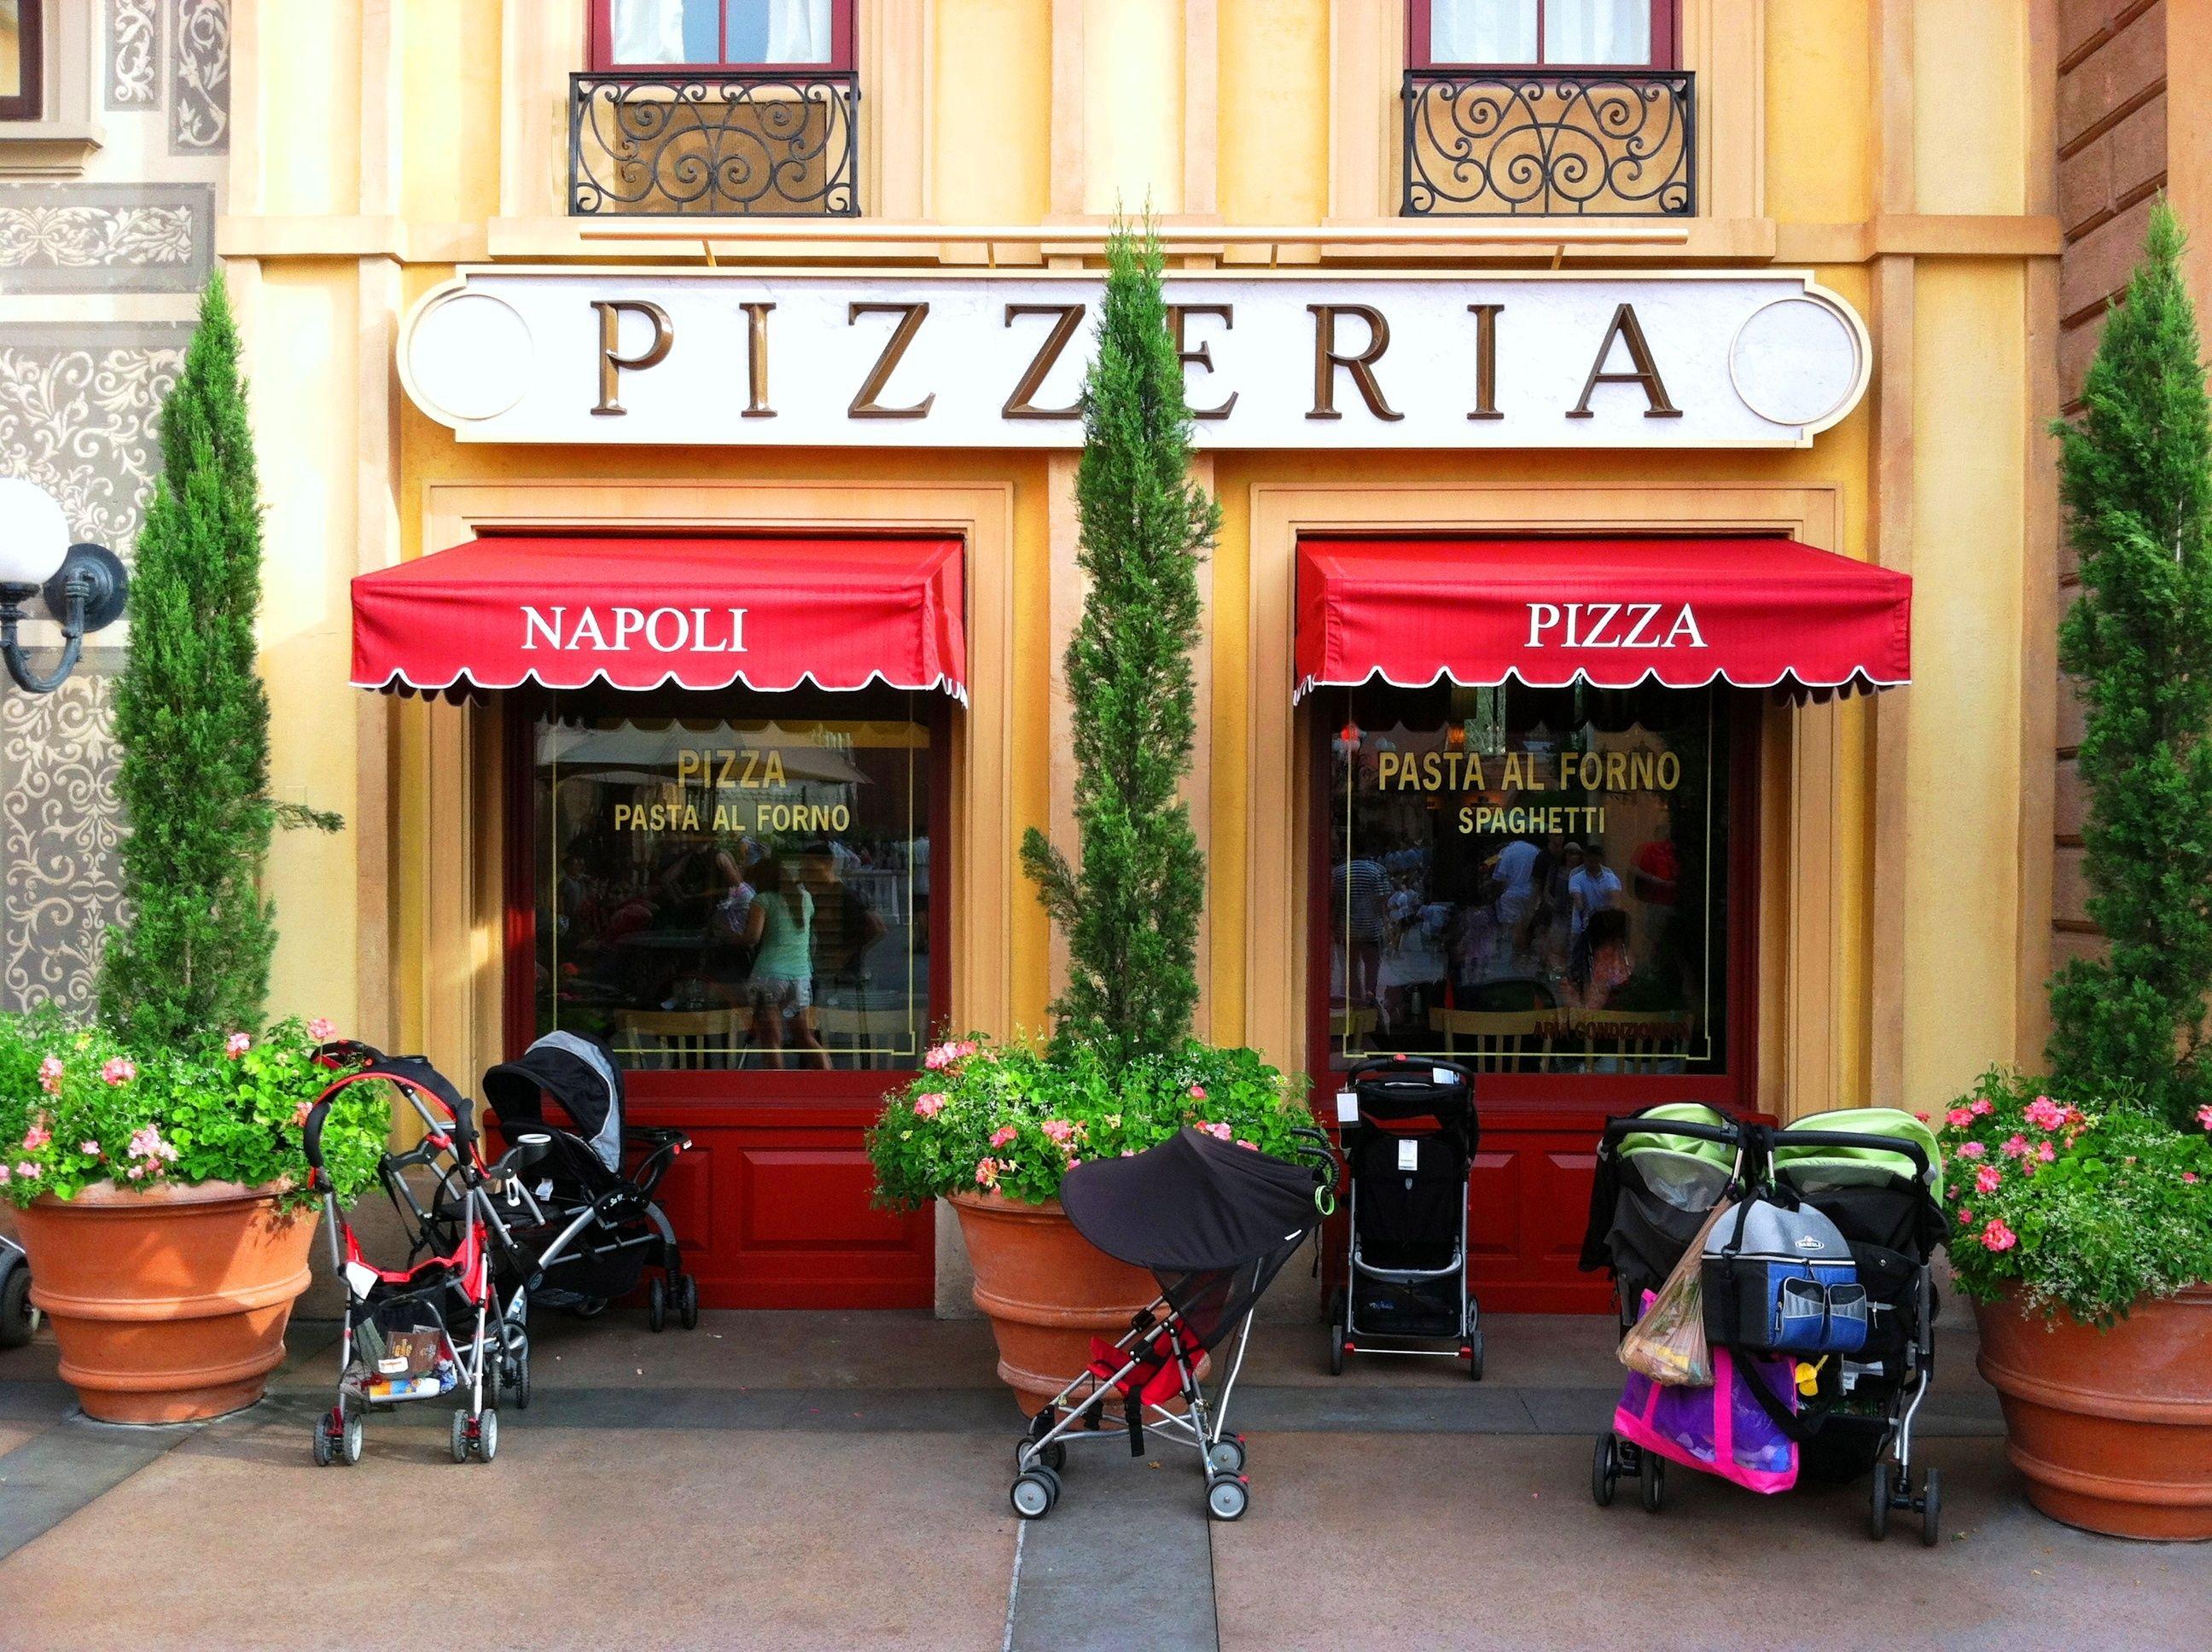 Italian restaurant exterior - Walt Disney World S Epcot Italy World Showcase Napoli Pizzeria Store Front Gardens And Flower